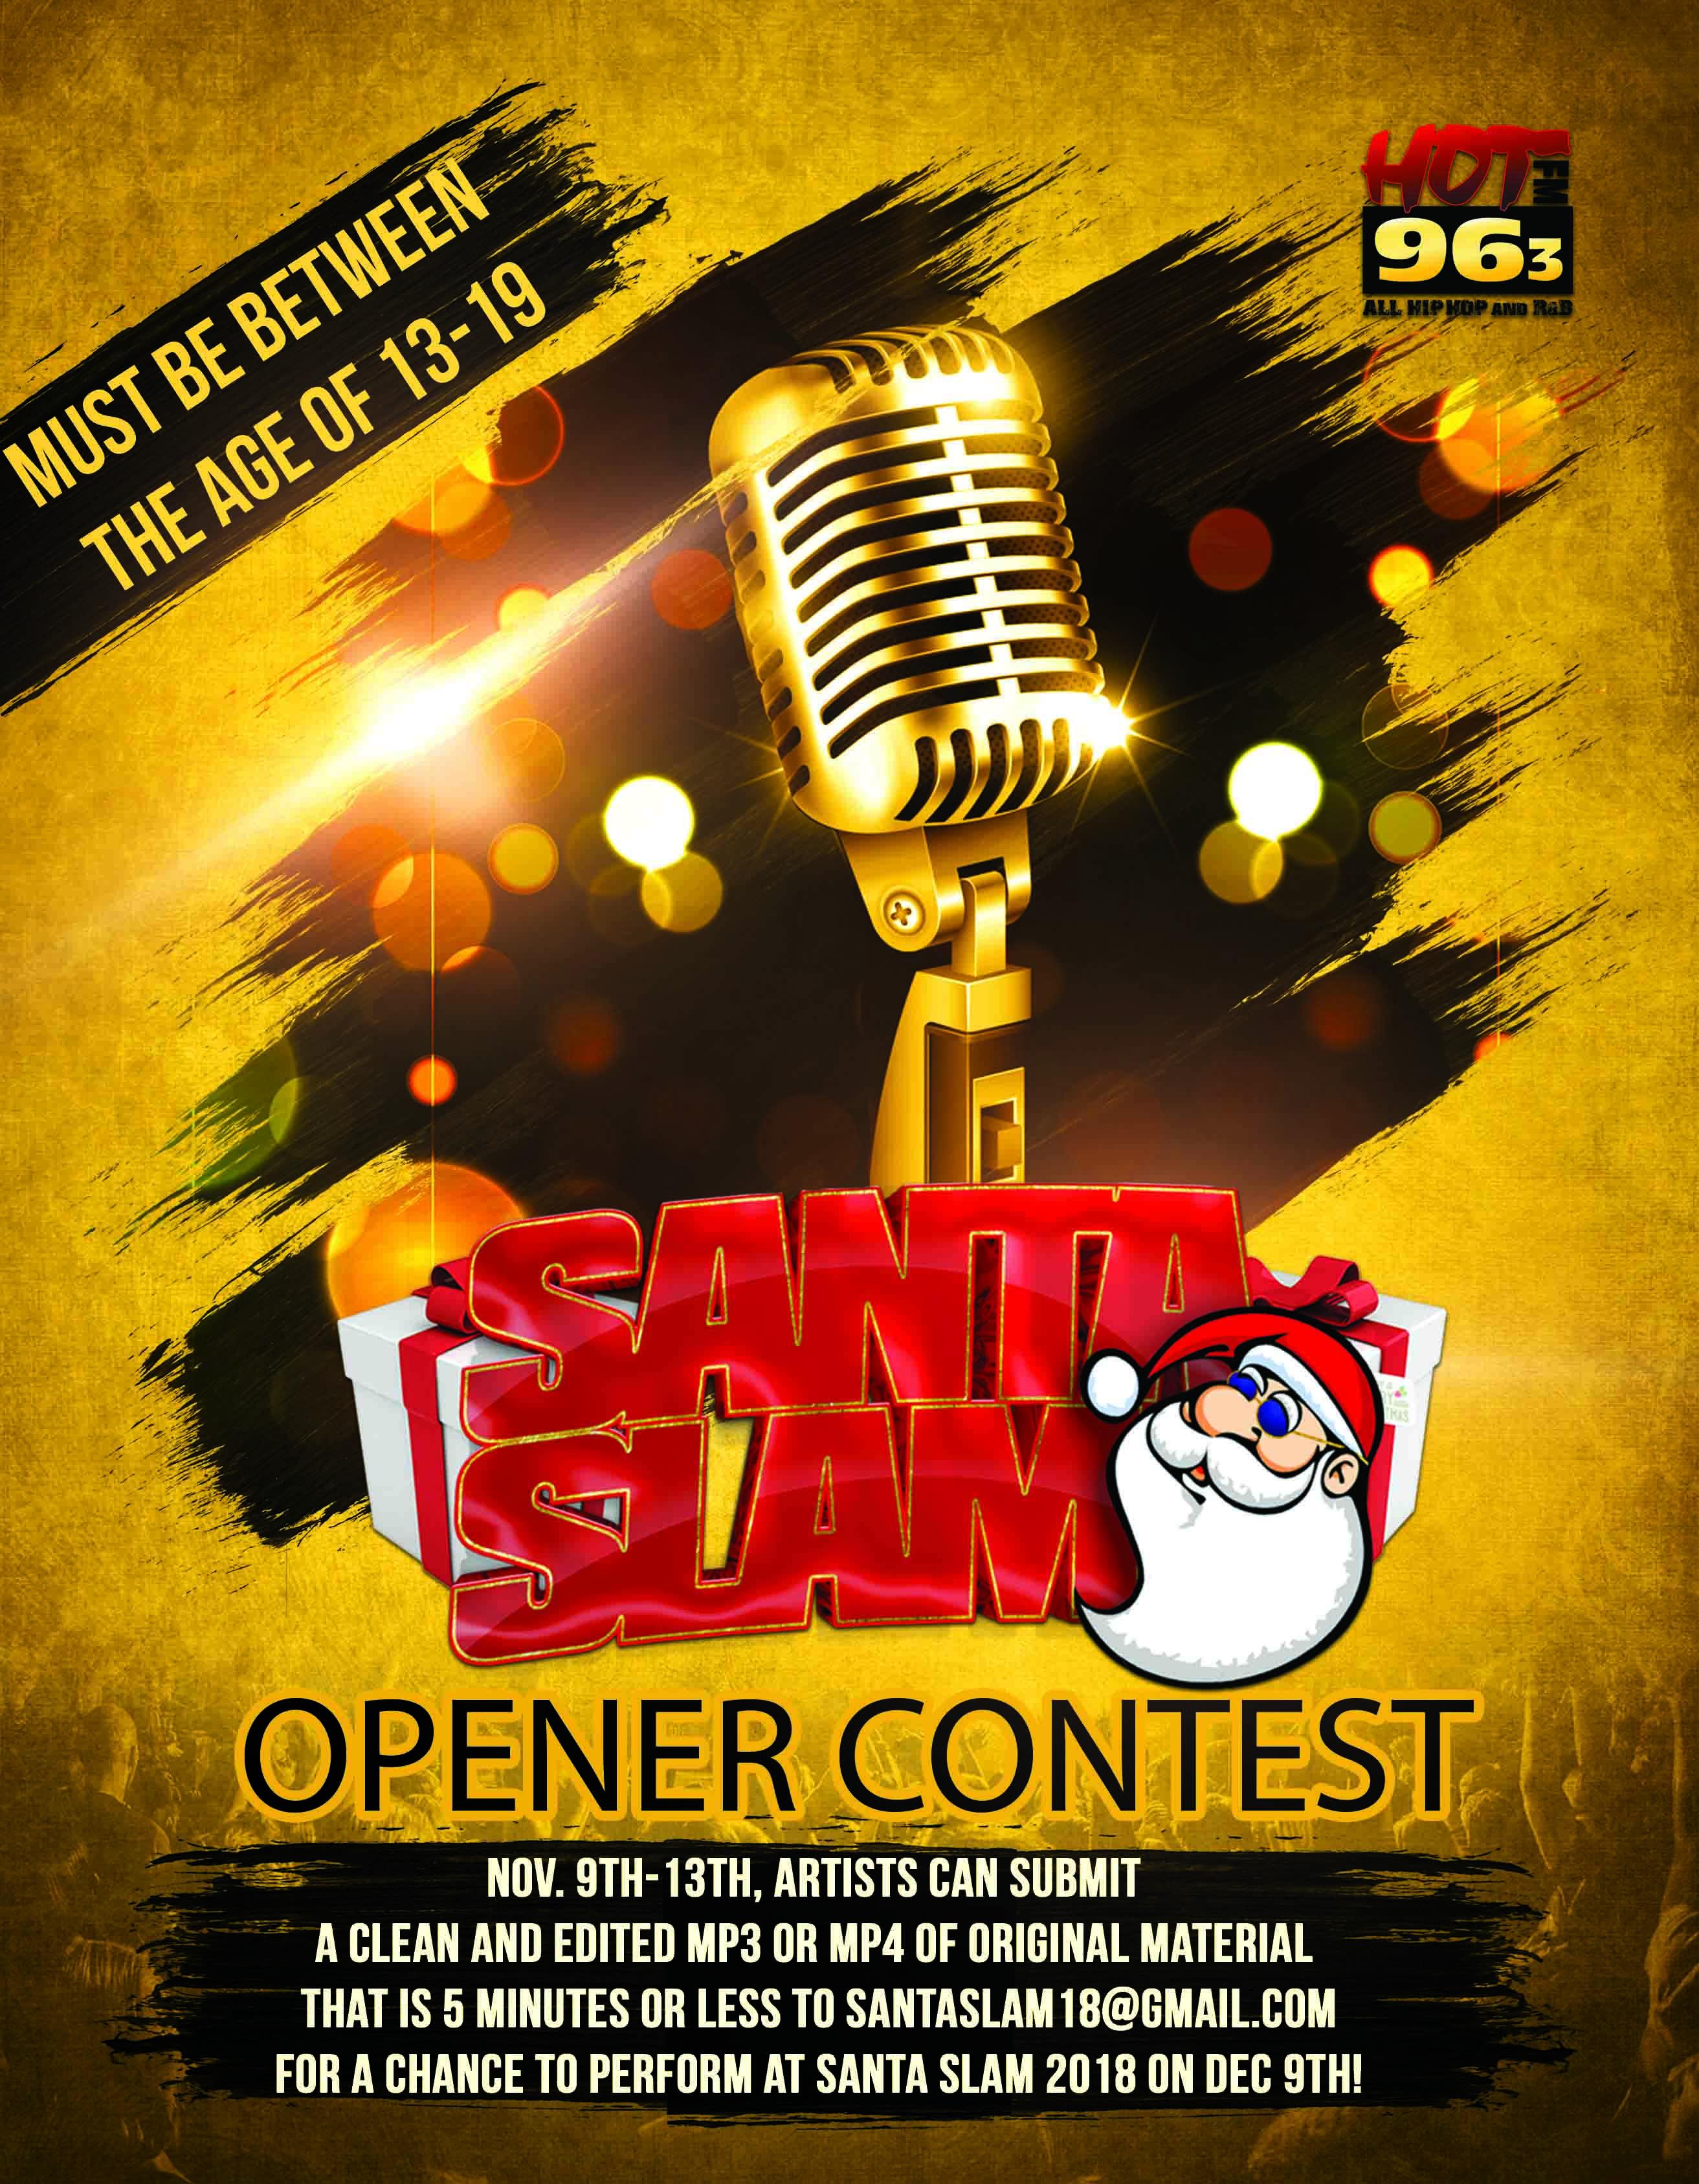 Santa Slam Opener Contest Flyer